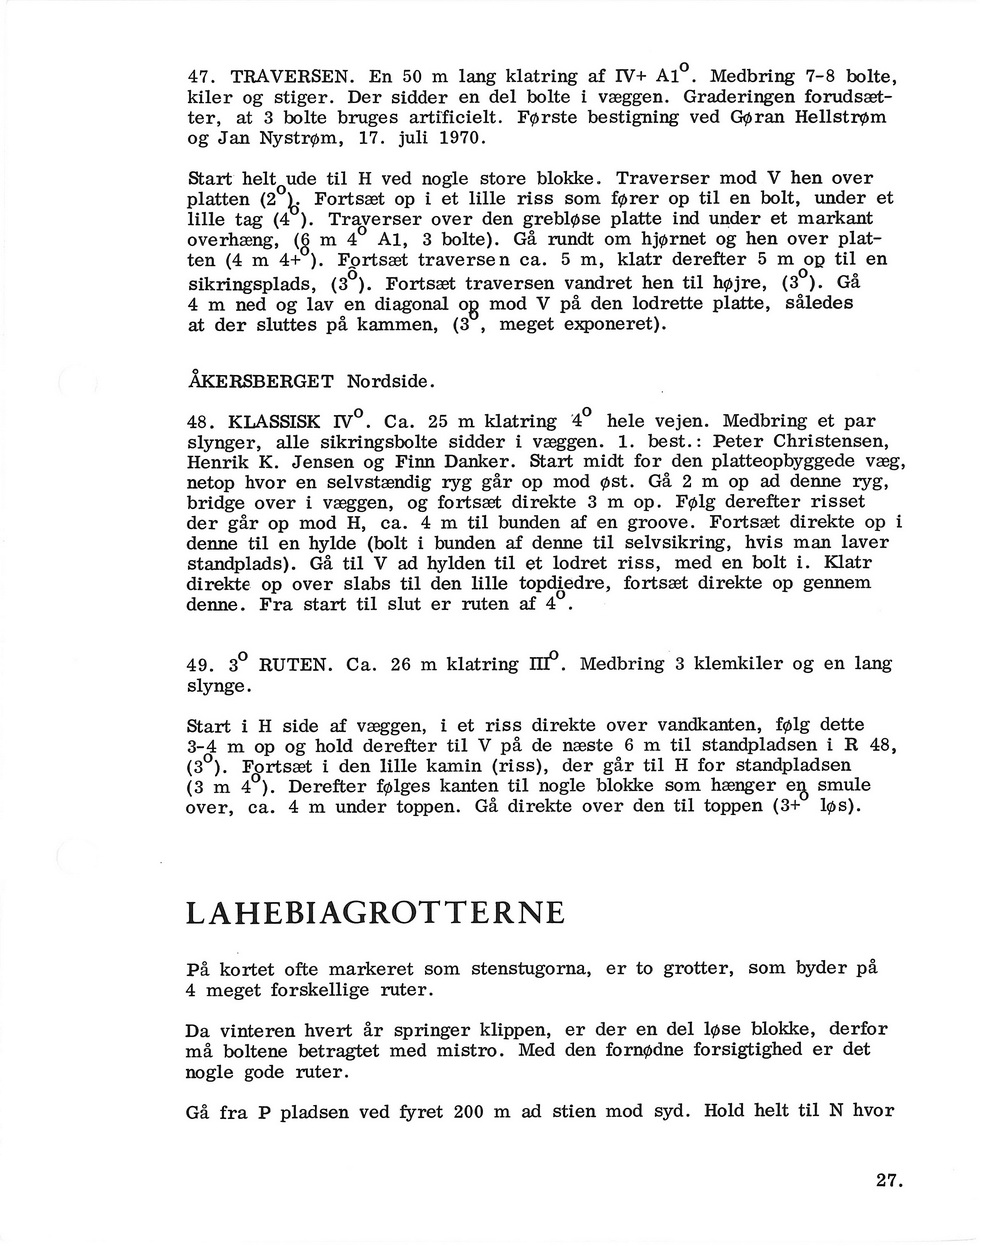 Kullen guide 1972 027.jpg